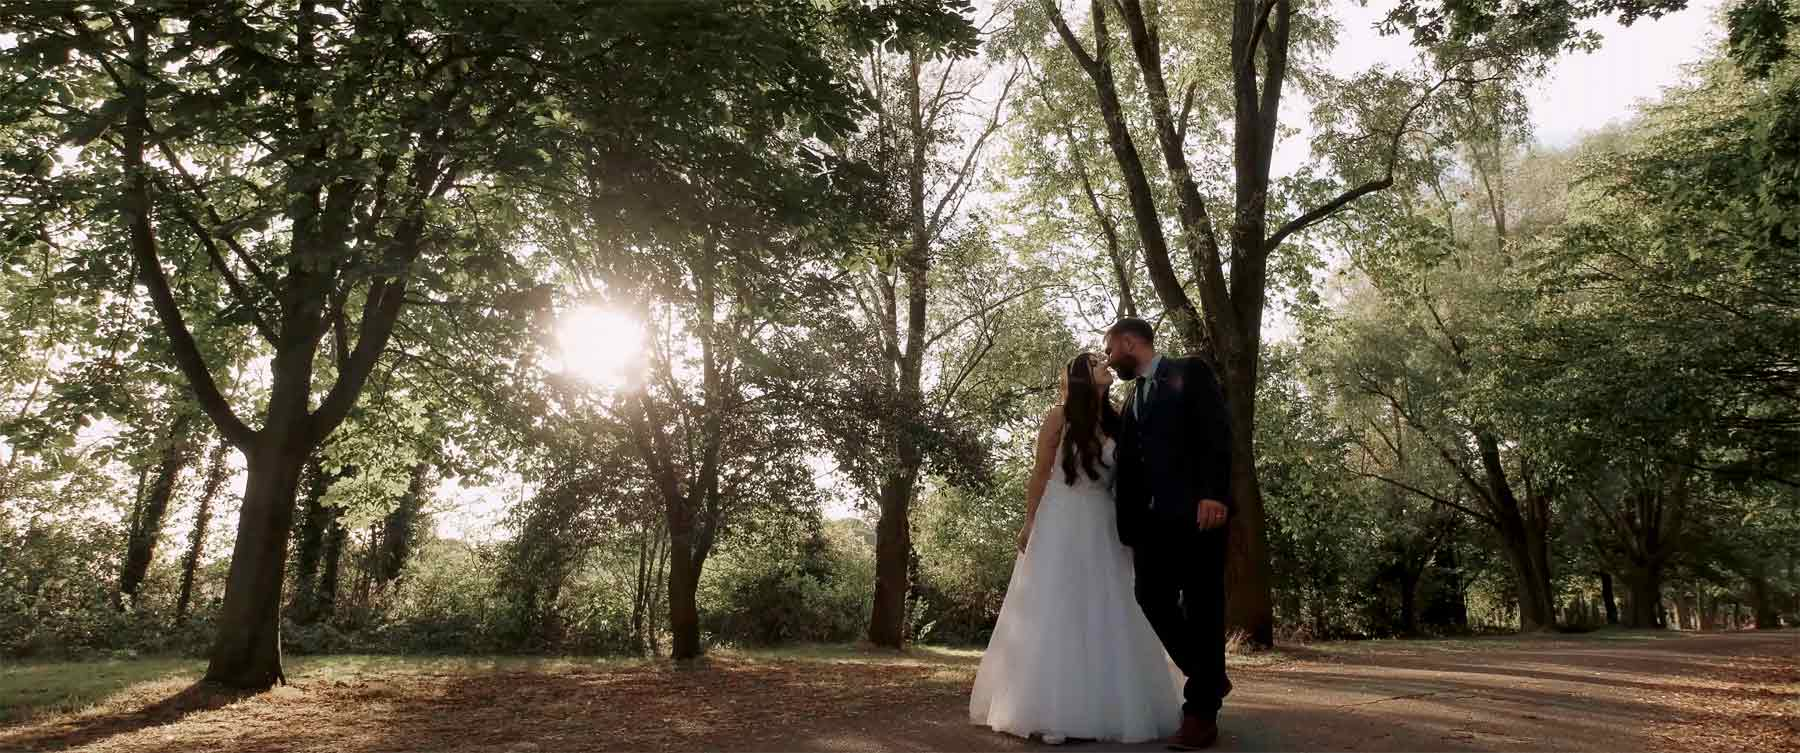 Wedding at The Great Barn London